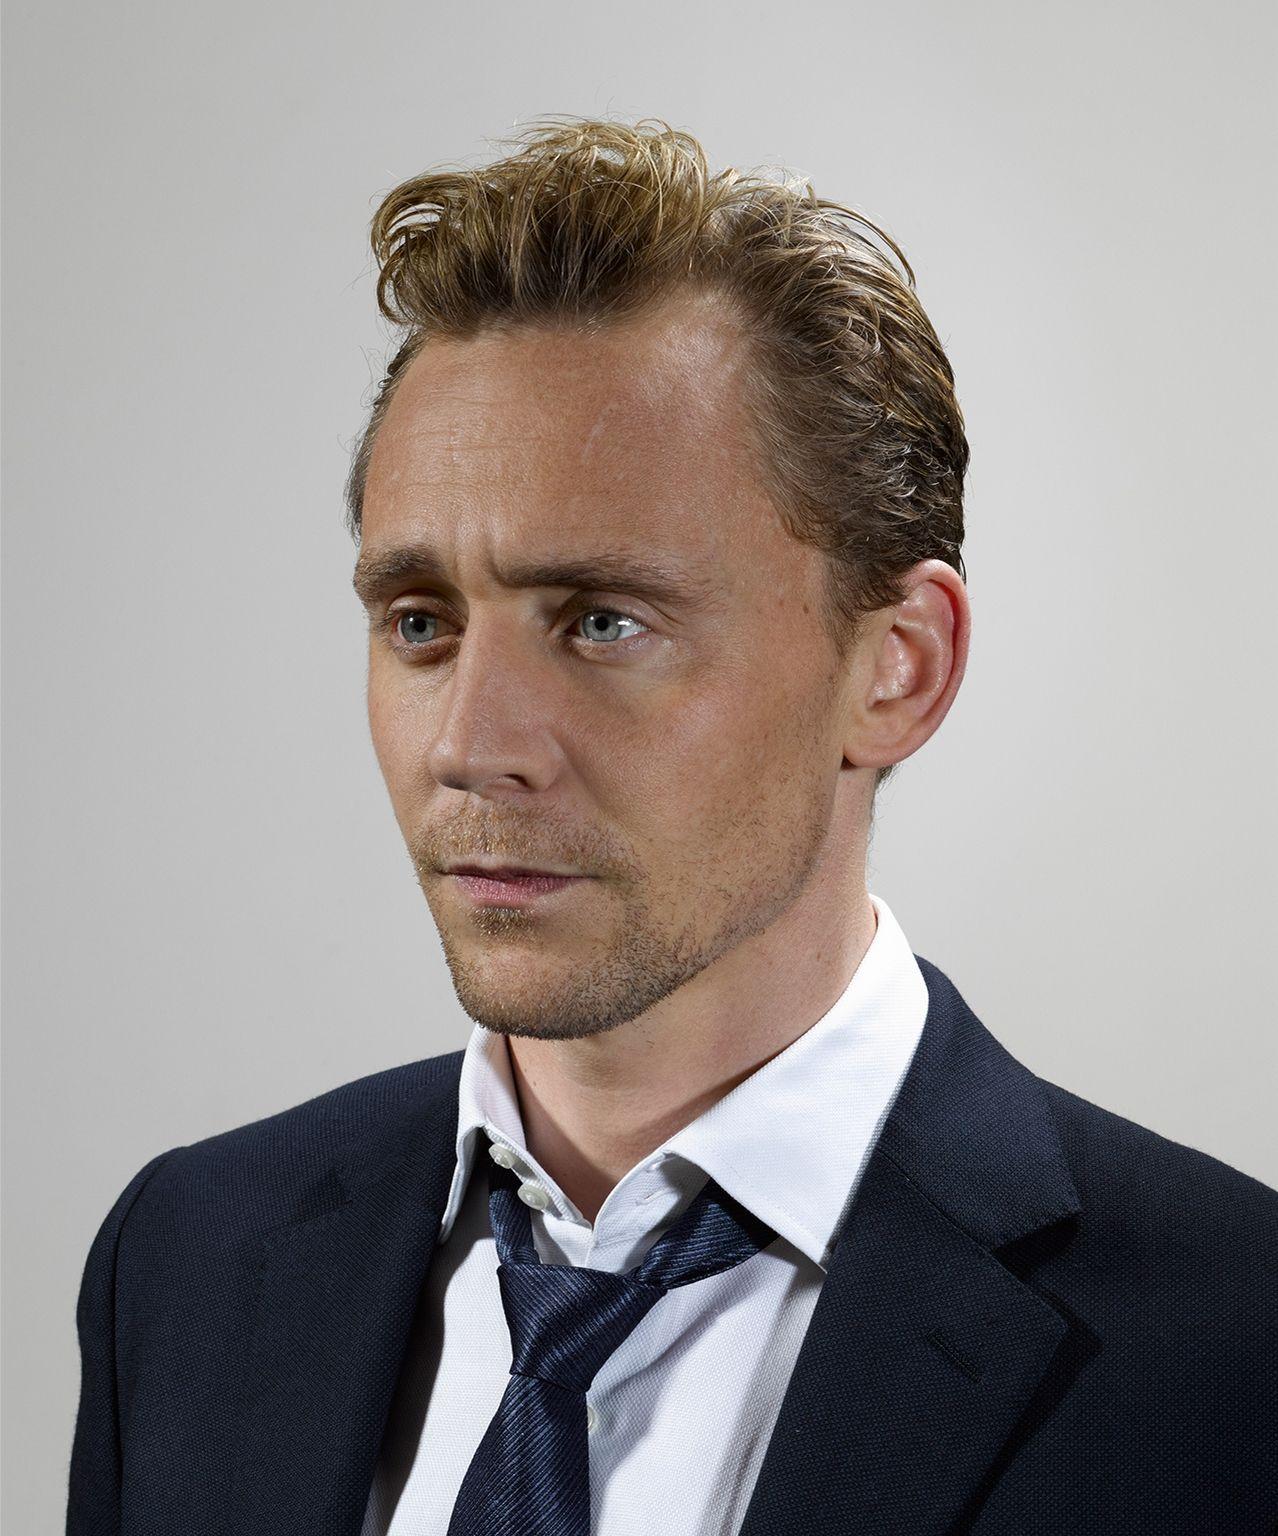 Tom Hiddleston. Photographed by Daniel Stier. Via Torrilla.